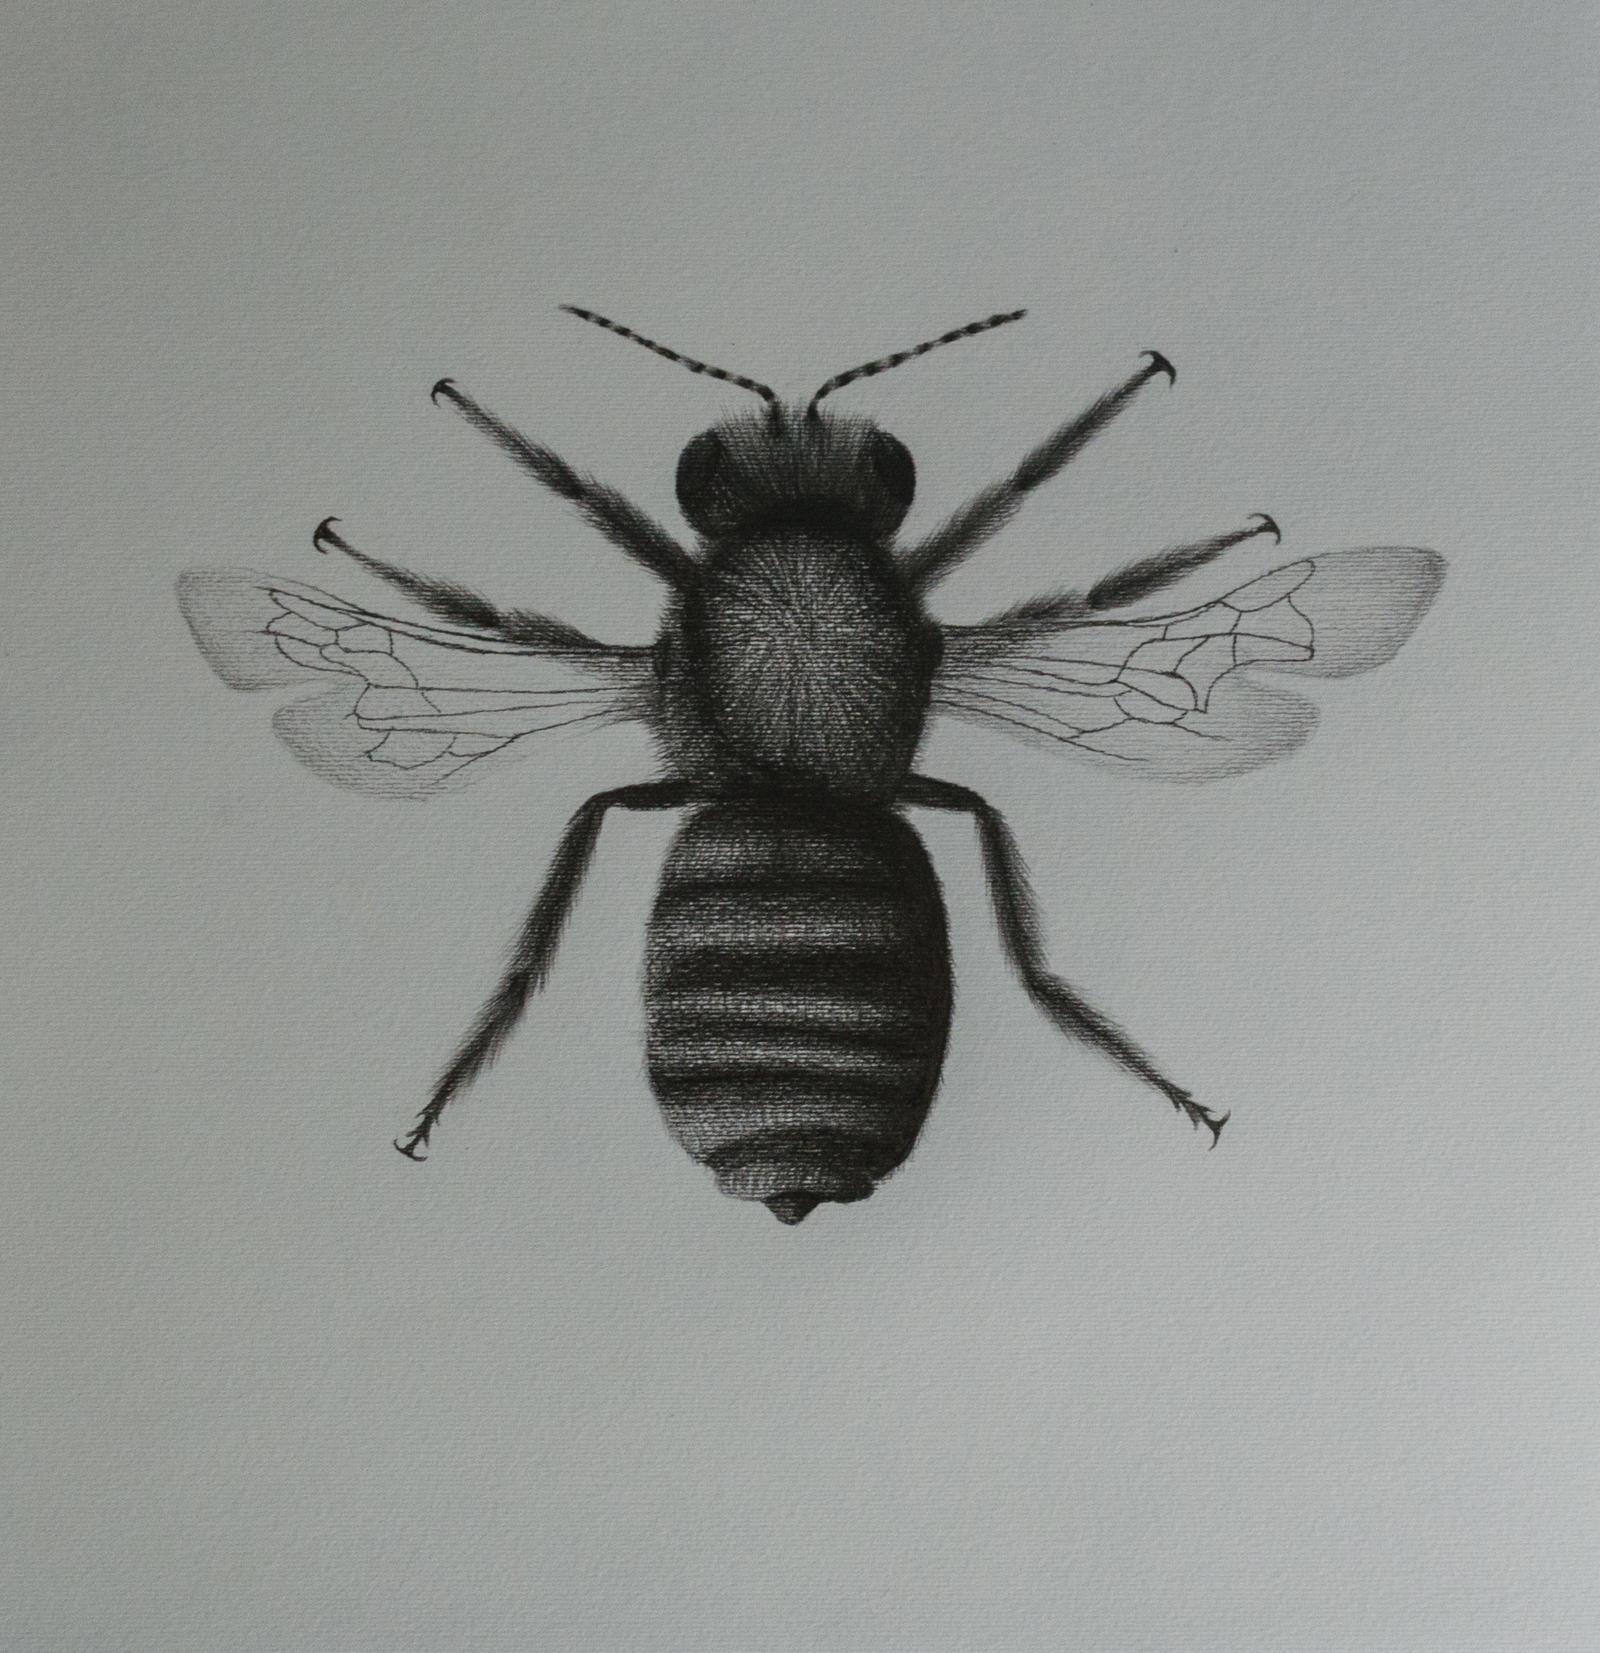 A bee